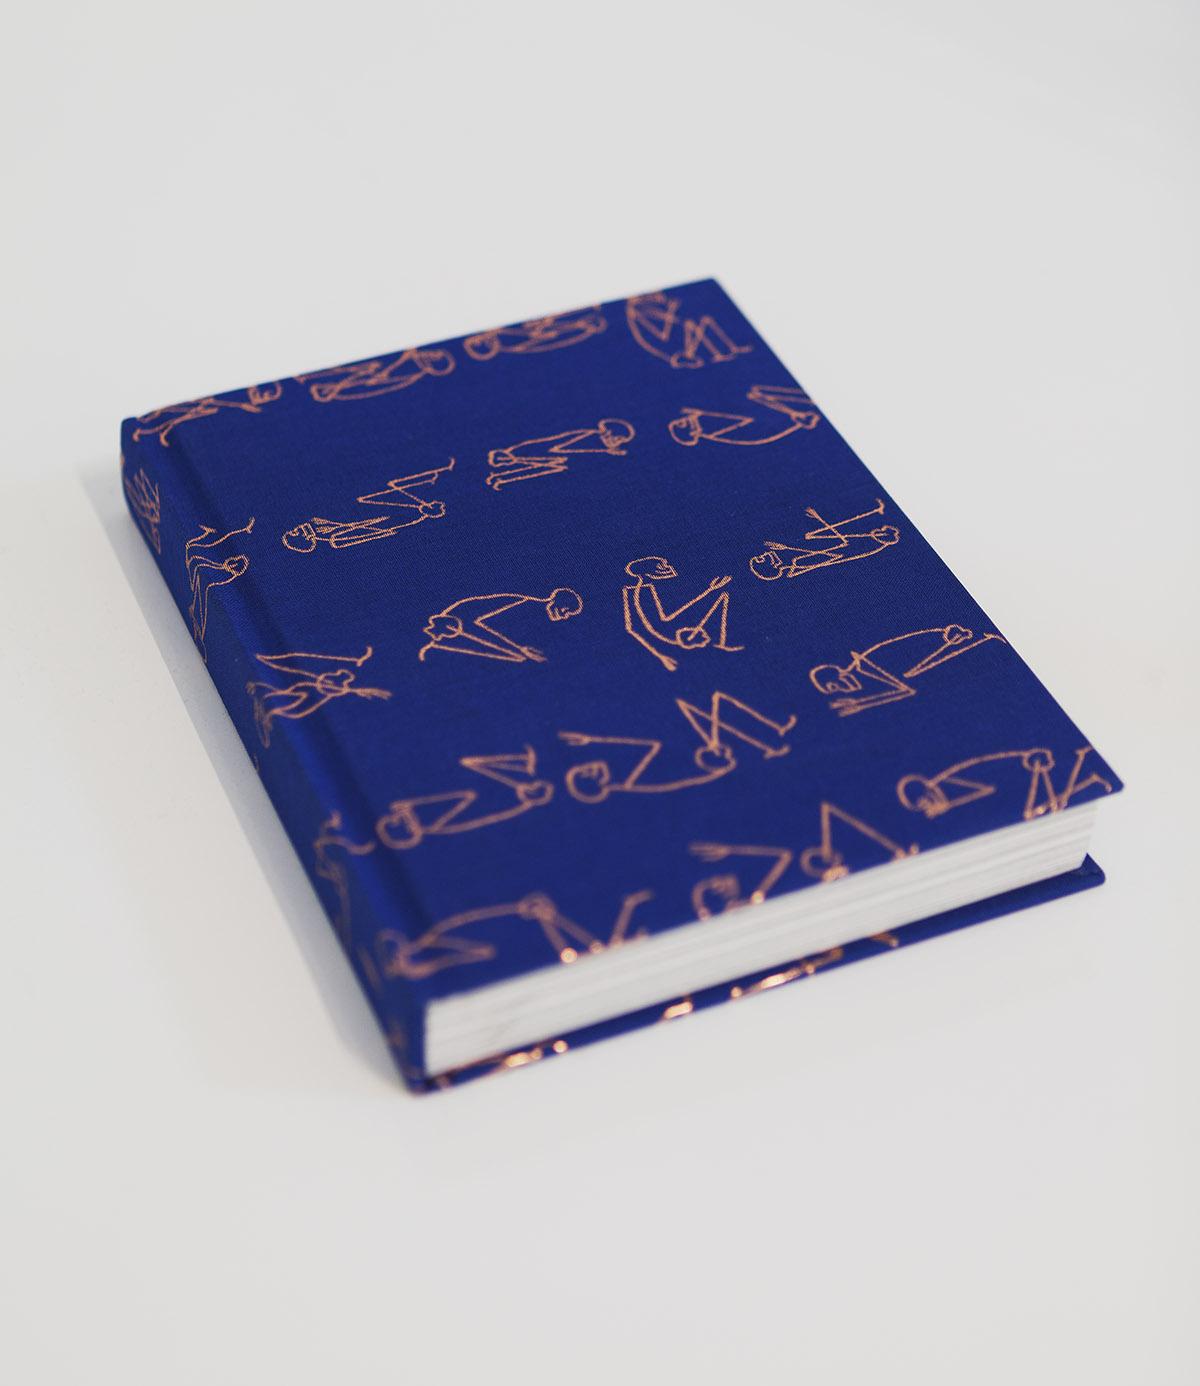 One Thousand Books_039_ID8777